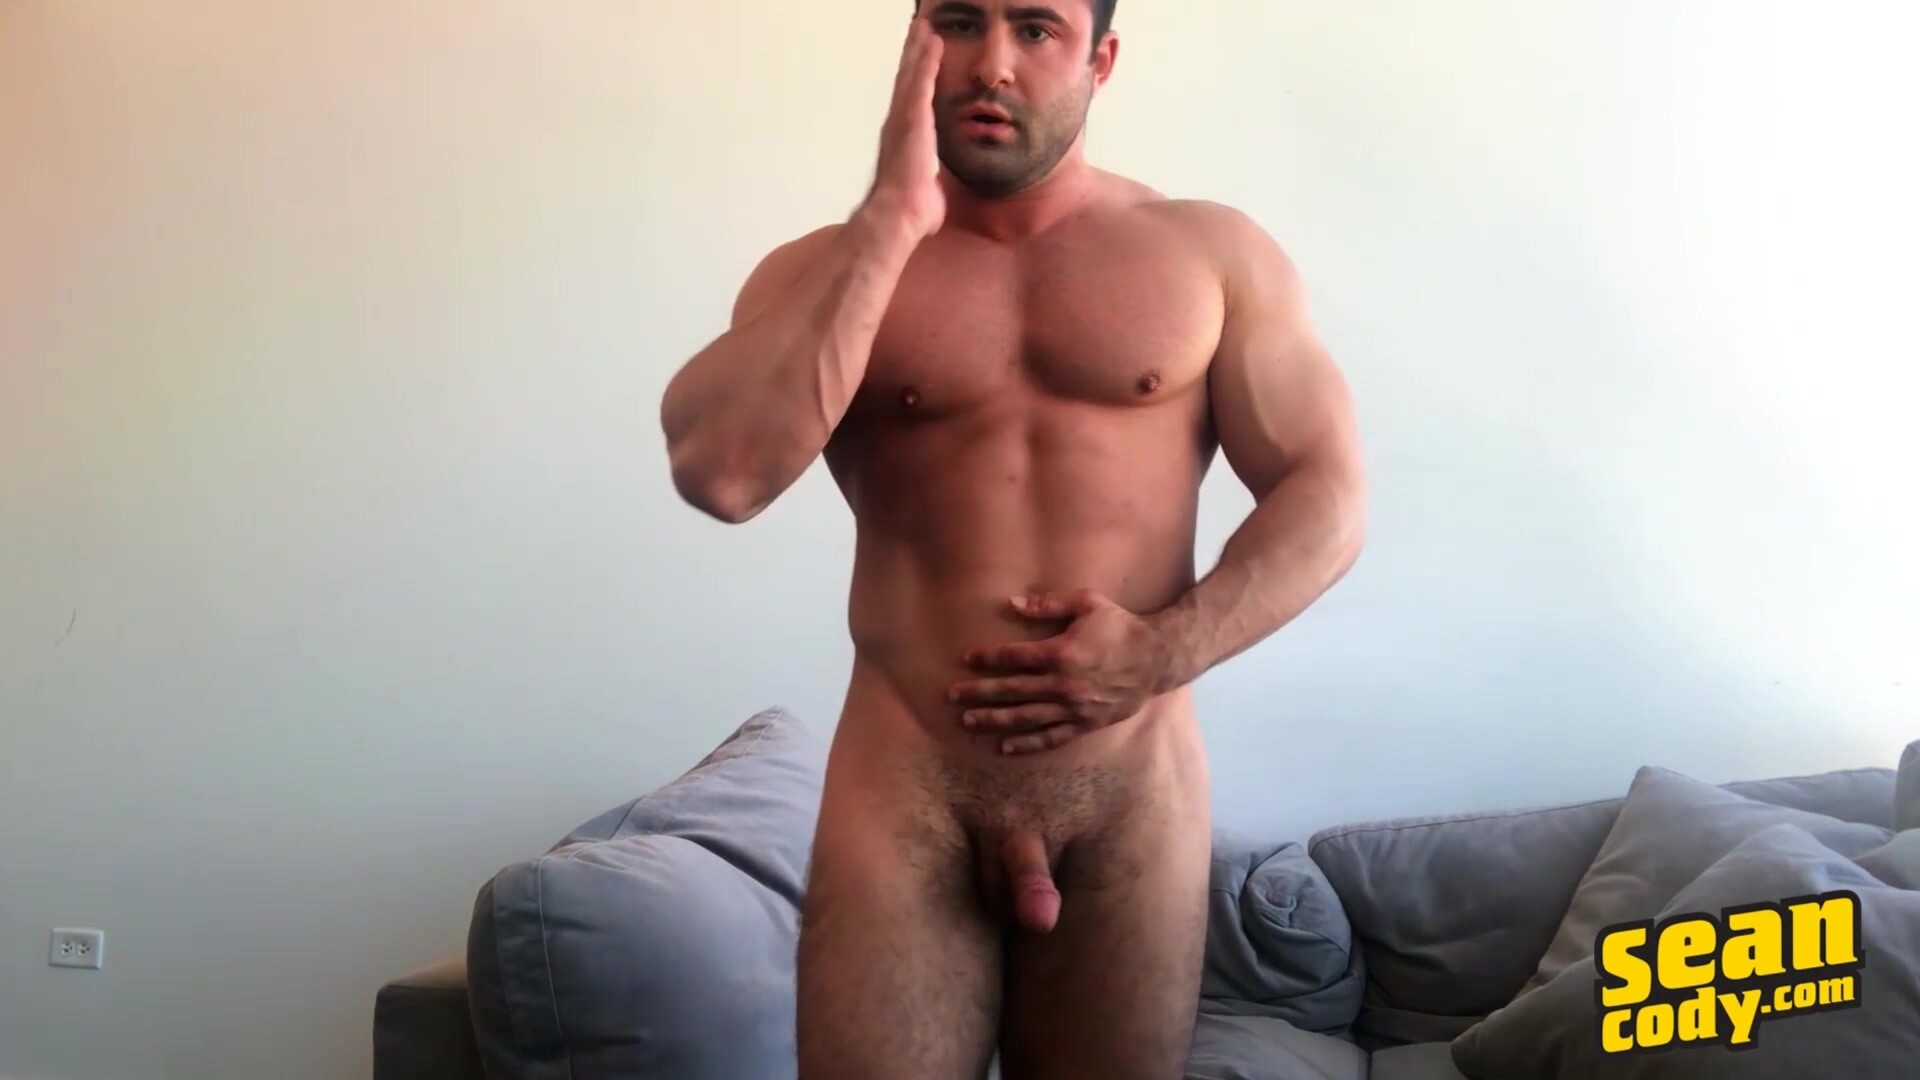 Sean Cody - Reese - SOLO - Gay Movie